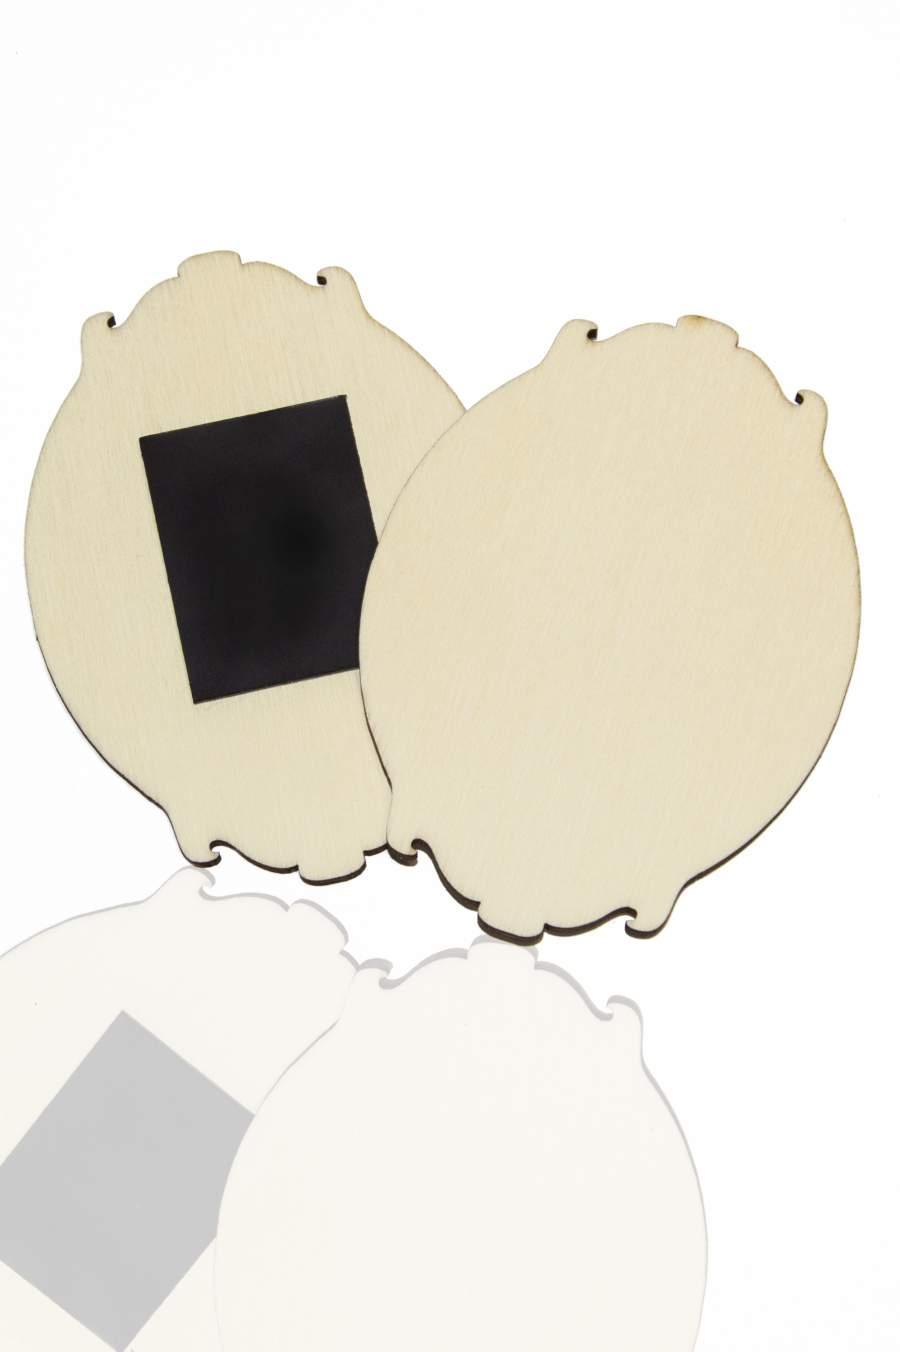 115. Drevená magnetka na chladničku – základný materiál 90x65mm